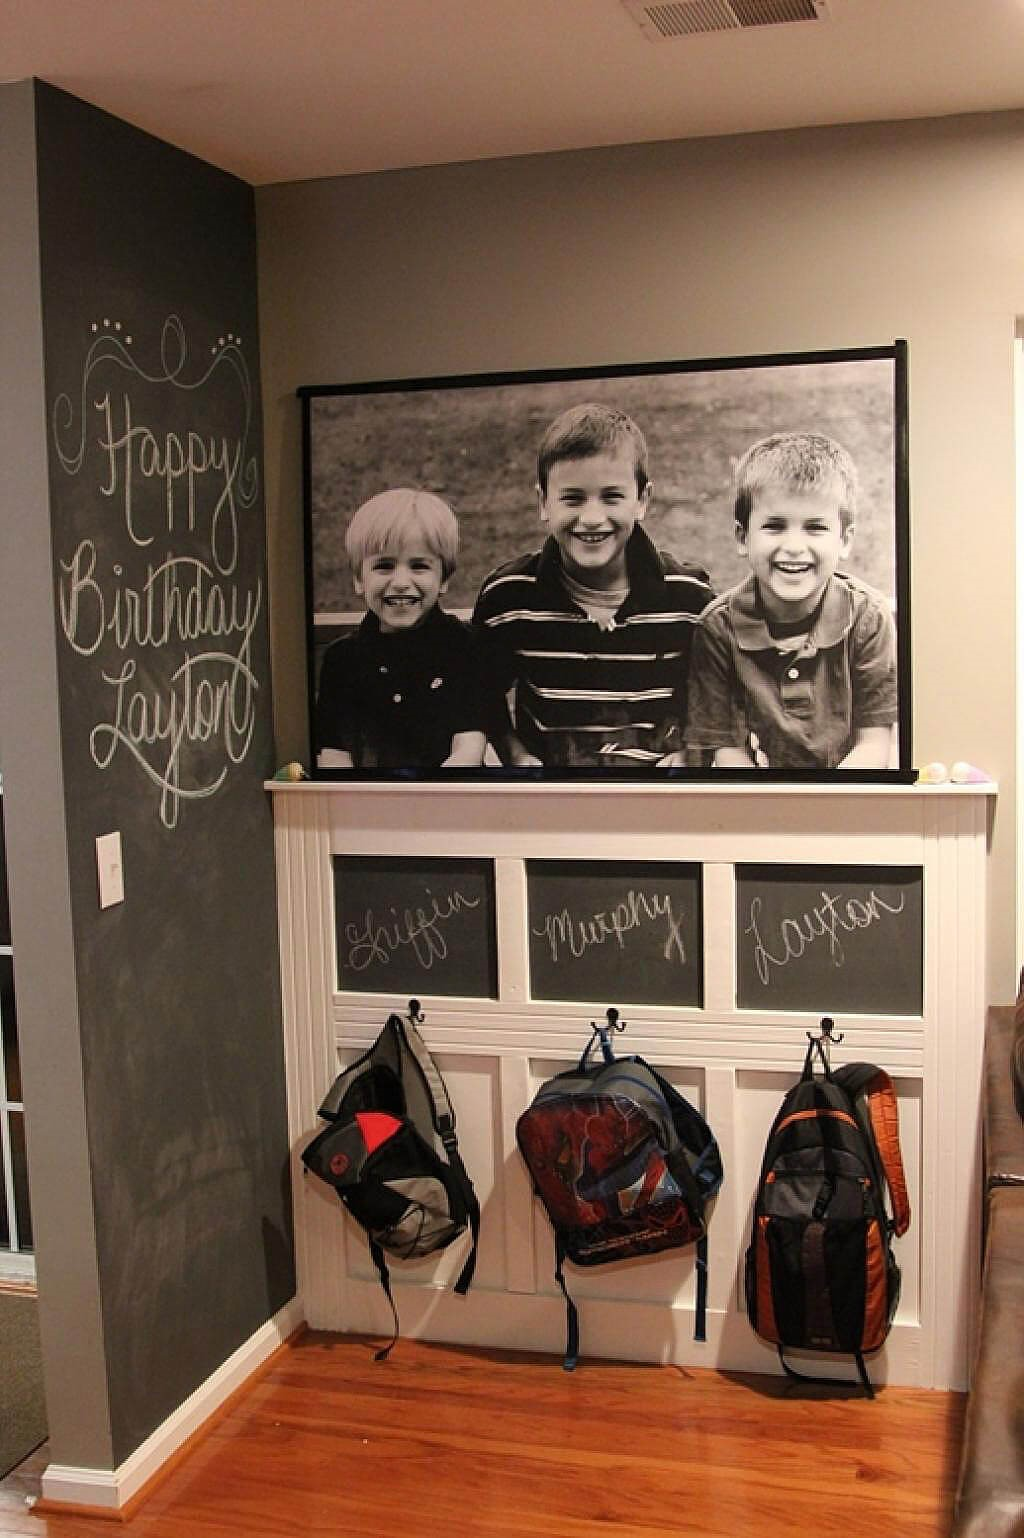 1 Chalkboard Wallpaper for An Impressive Mudroom Simphome com